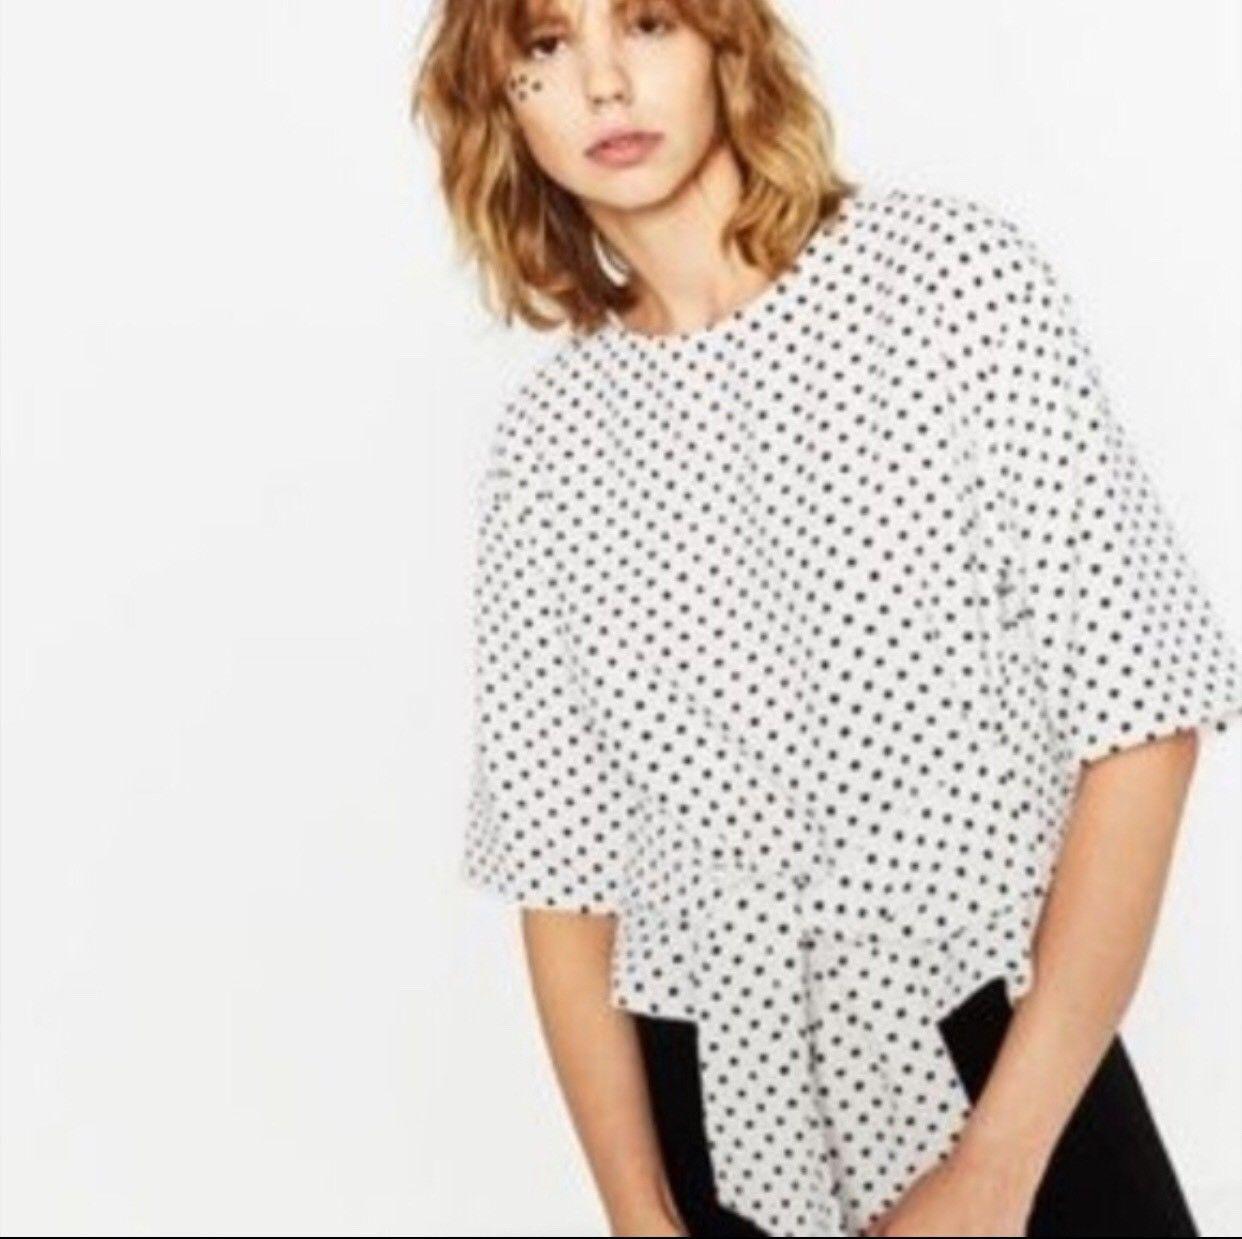 905a7c2e010aca 19.99 USD | zara polka dot tie front top size XS | #shirt #warehouse ...